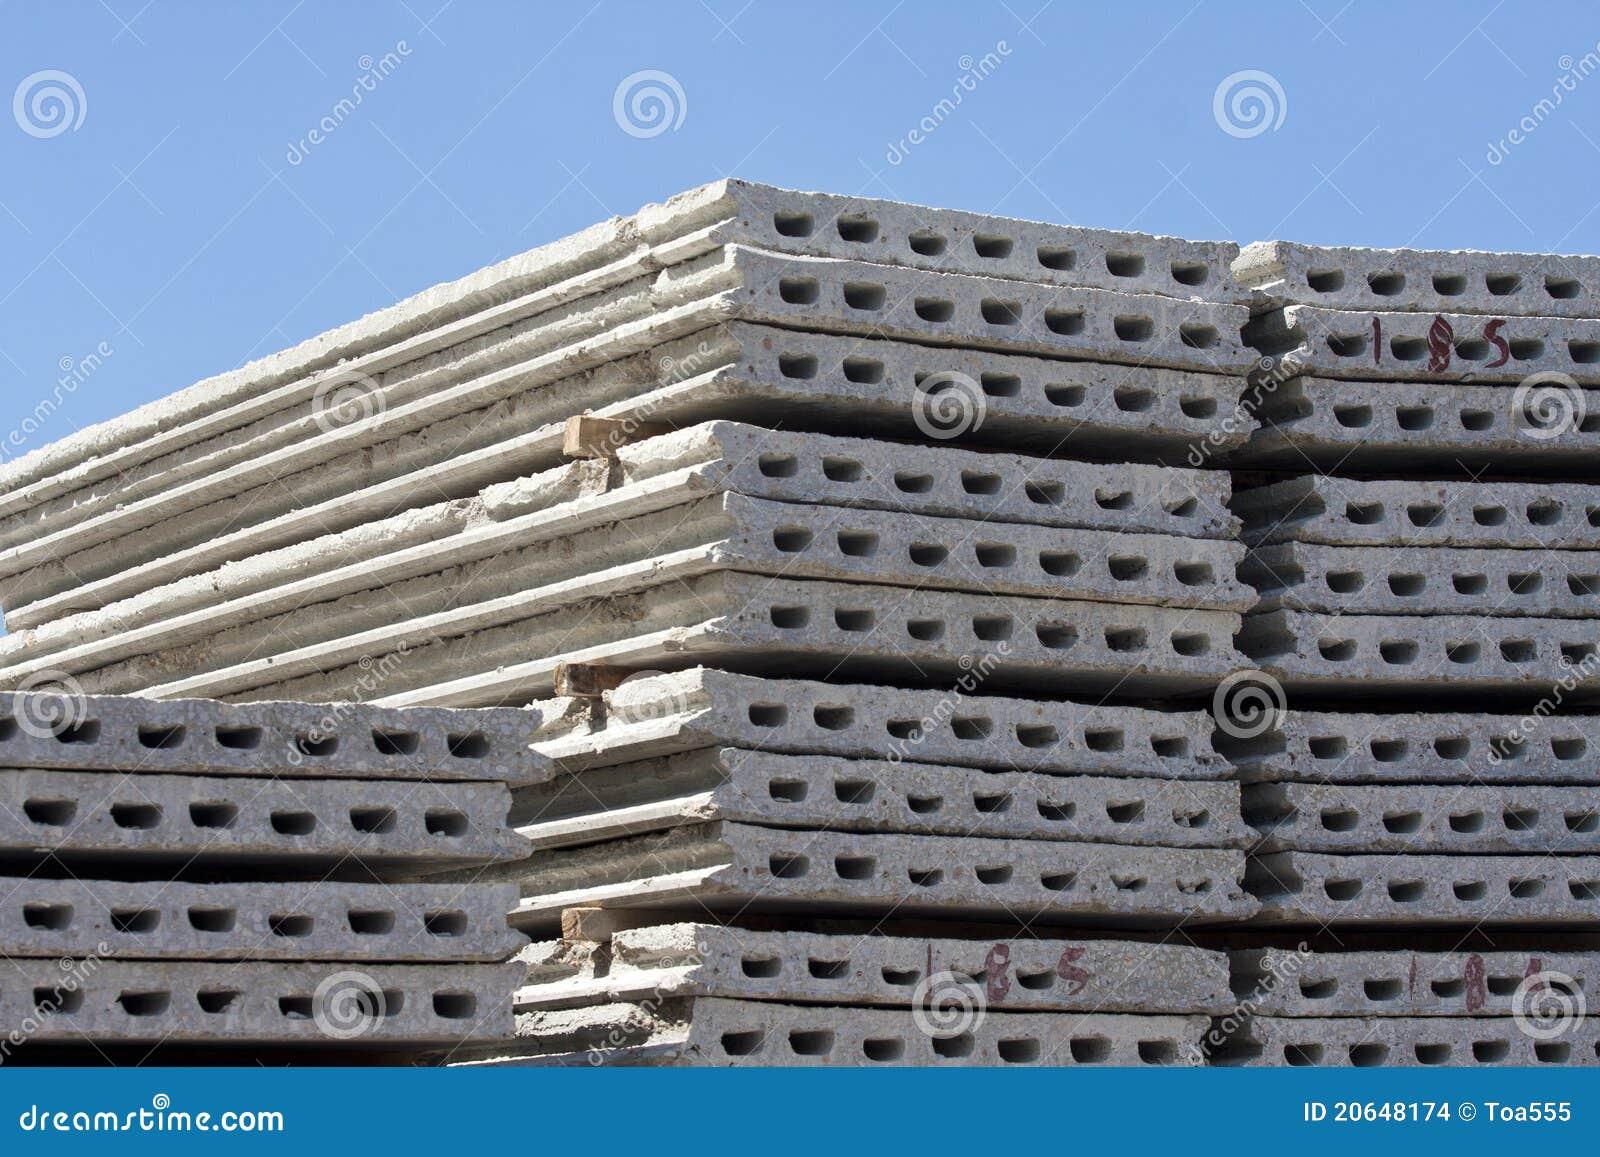 https://thumbs.dreamstime.com/z/hollow-core-concrete-floor-20648174.jpg